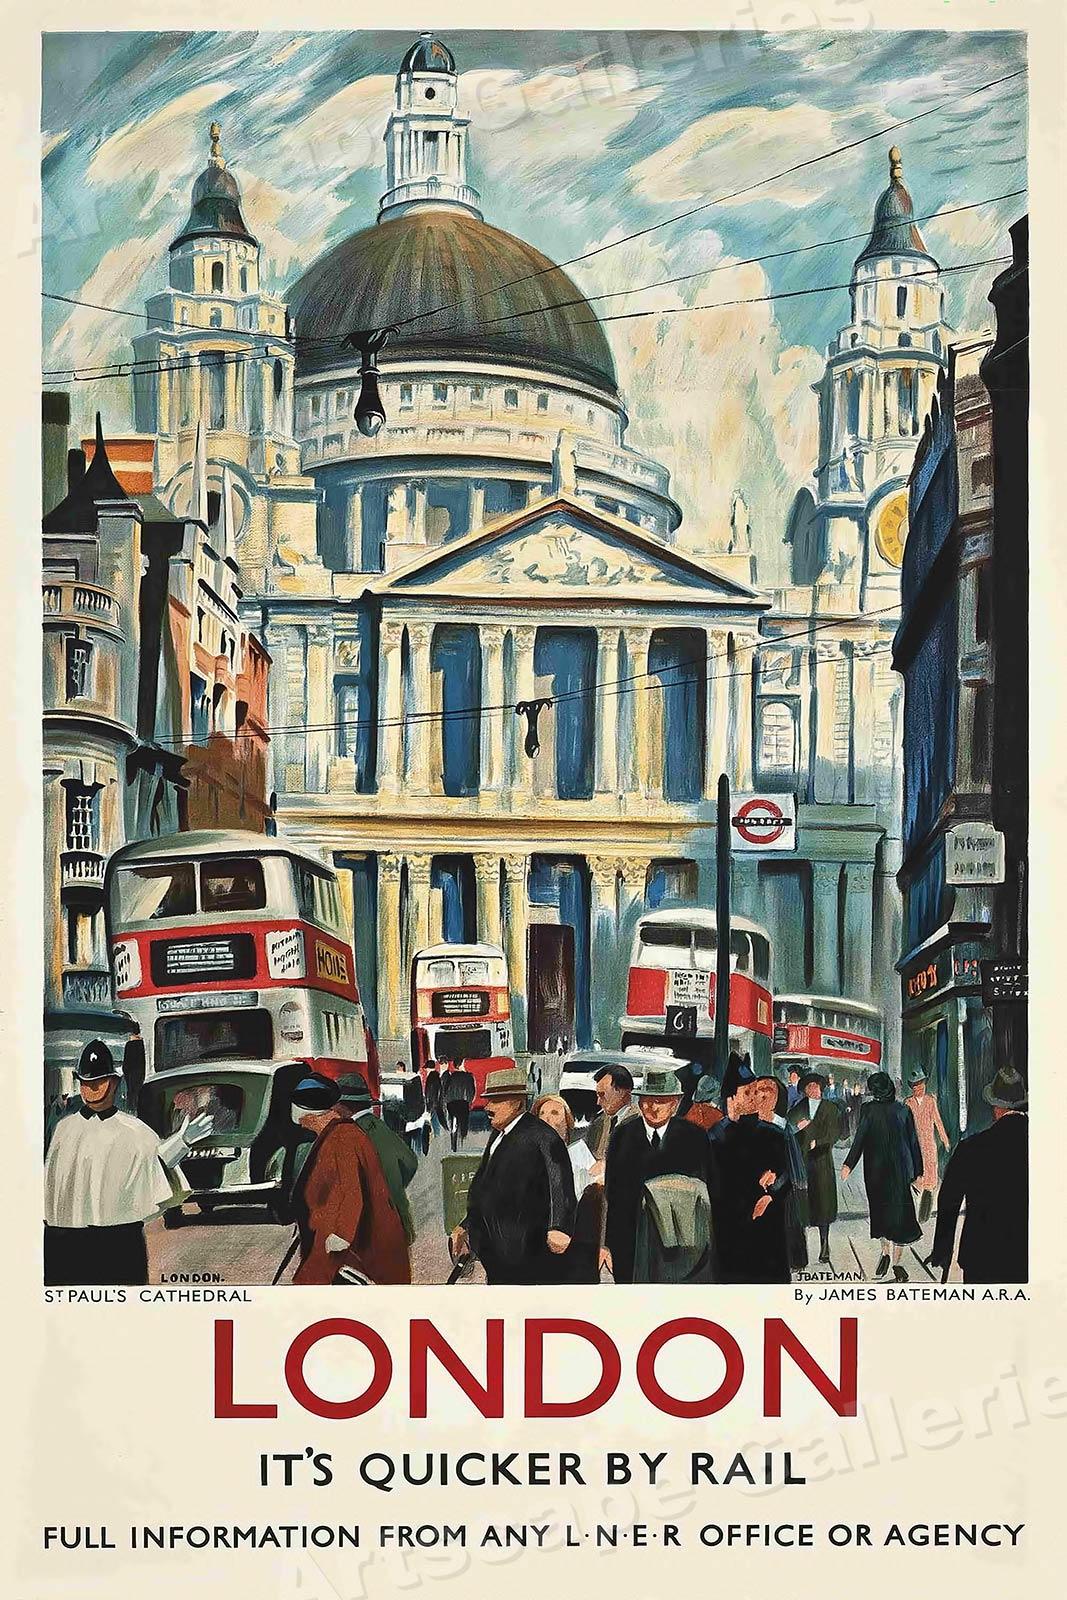 20x30 England Big Ben Parliament Vintage 1953 Travel Poster